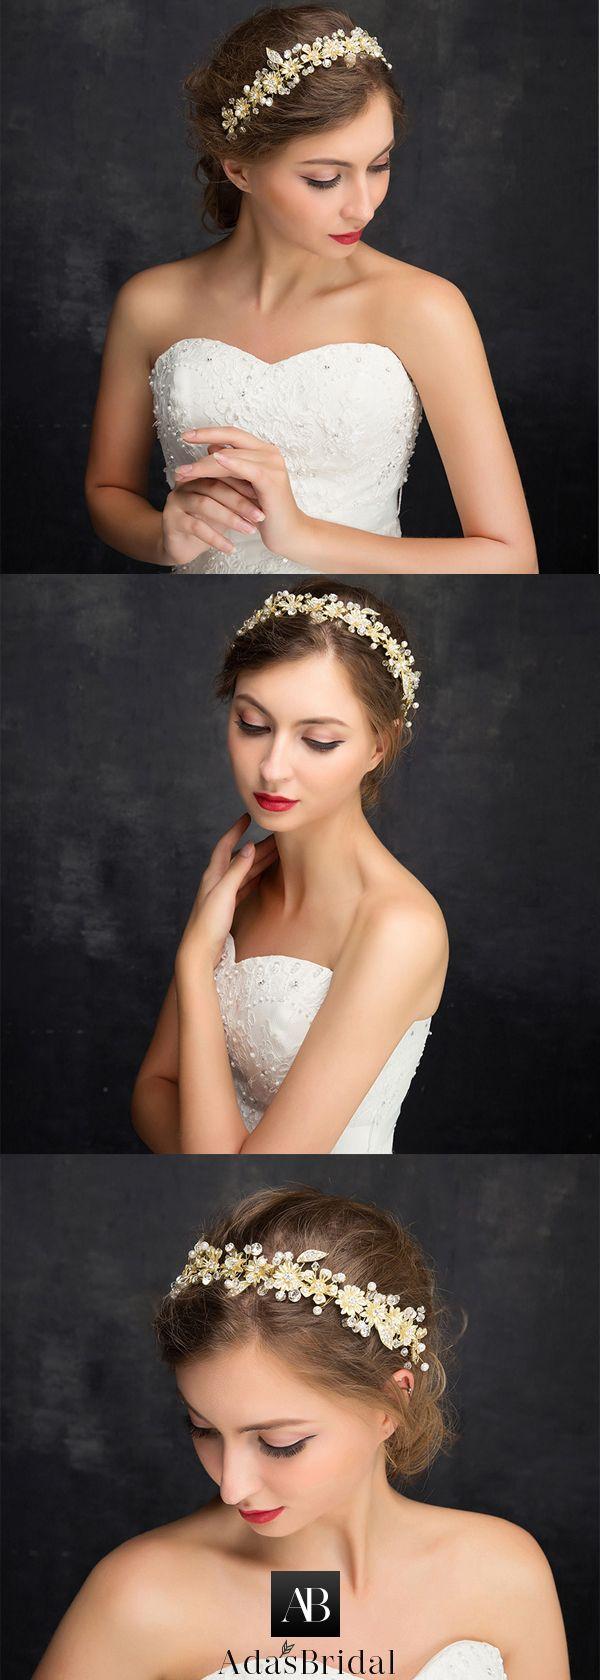 Attractive Alloy Wedding Hair Ornaments With Rhinestones